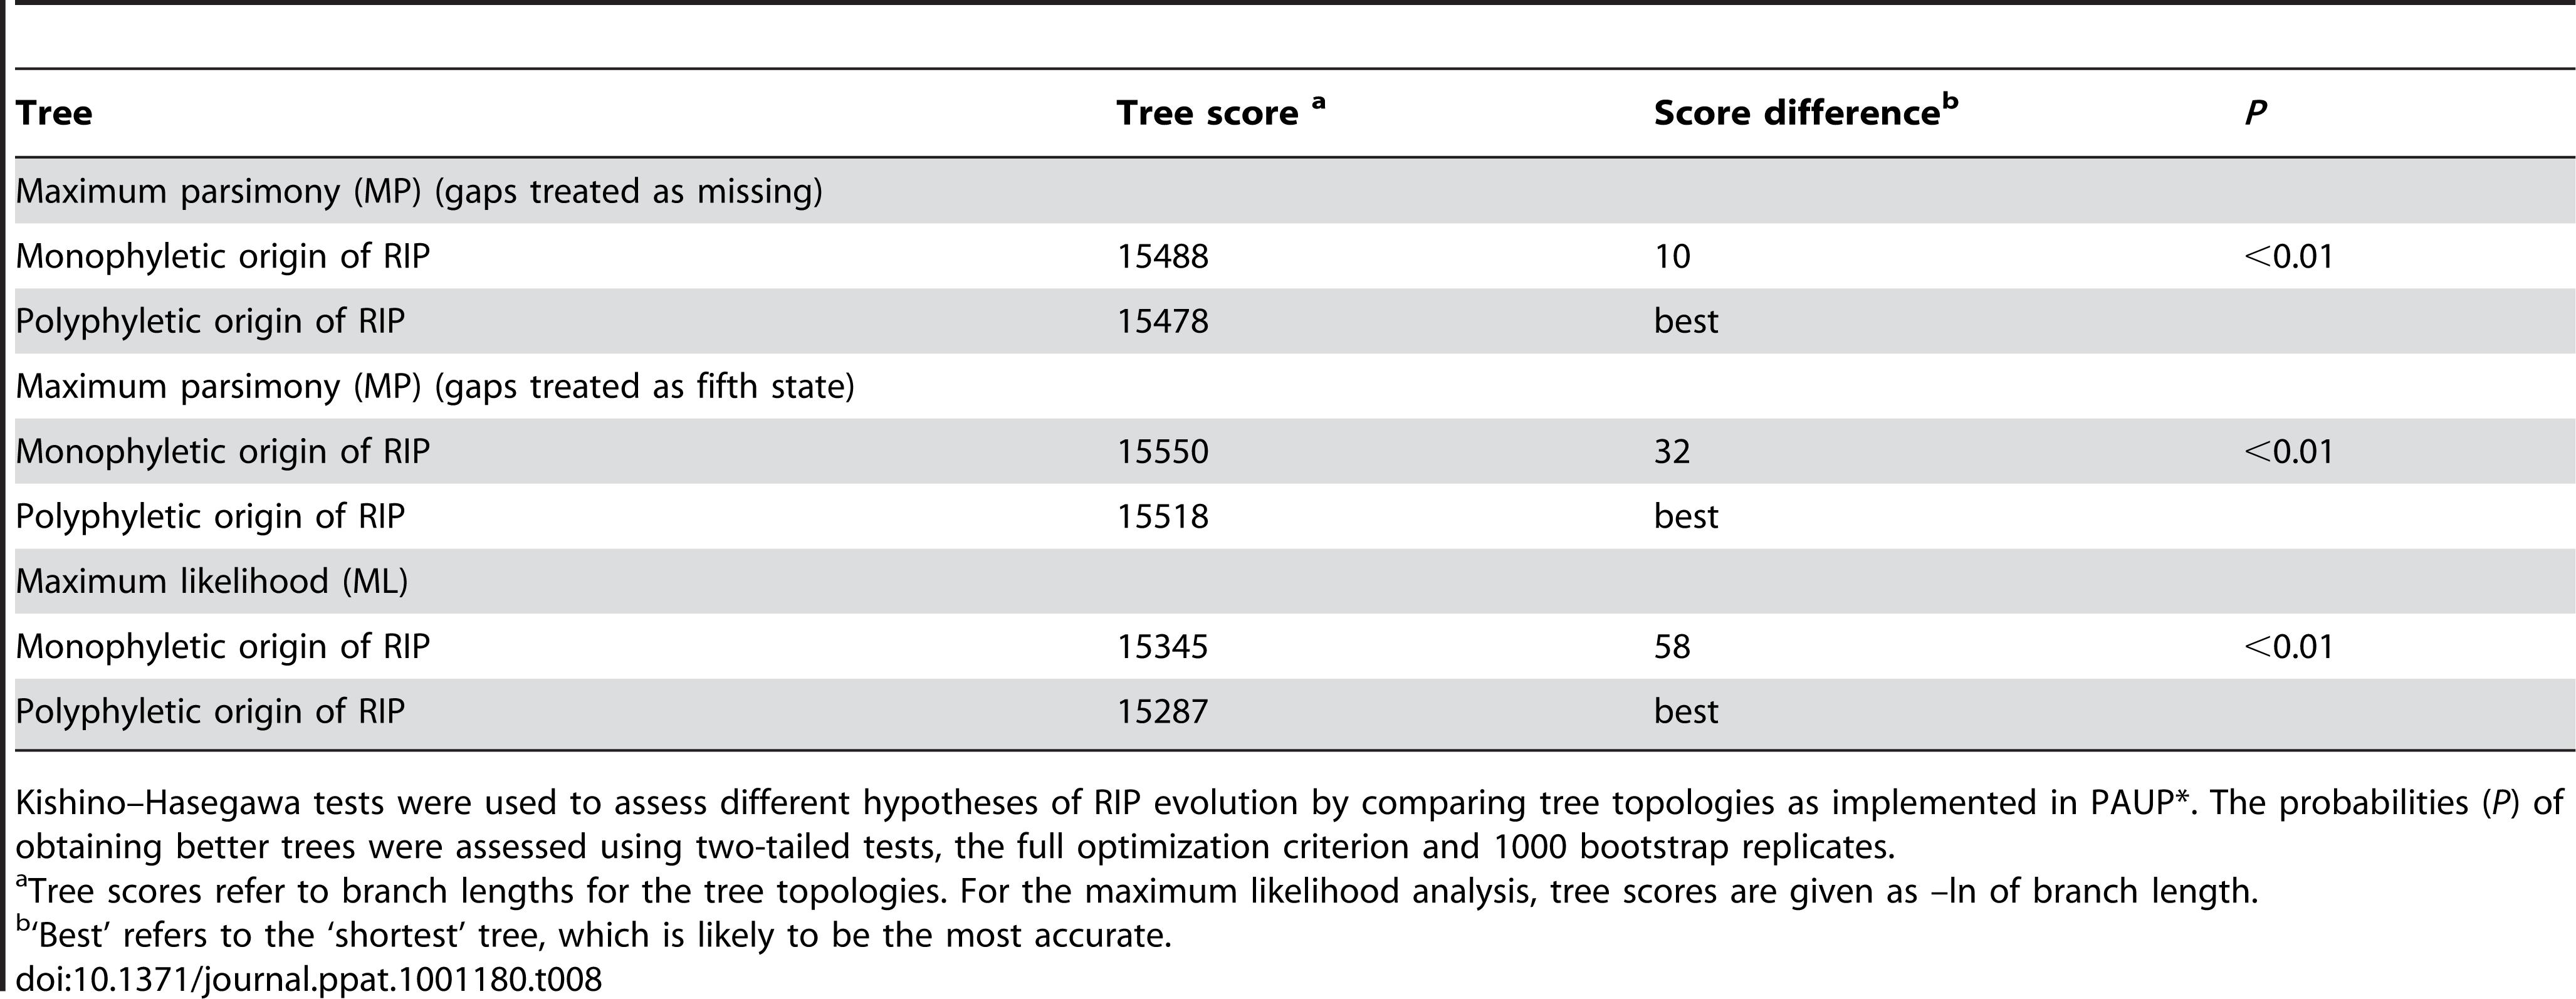 Hypothesis-testing of multiple (polyphyletic) vs. single (monophyletic) origin of RIP mutation-associated haplotypes of <i>Leptosphaeria maculans</i>.